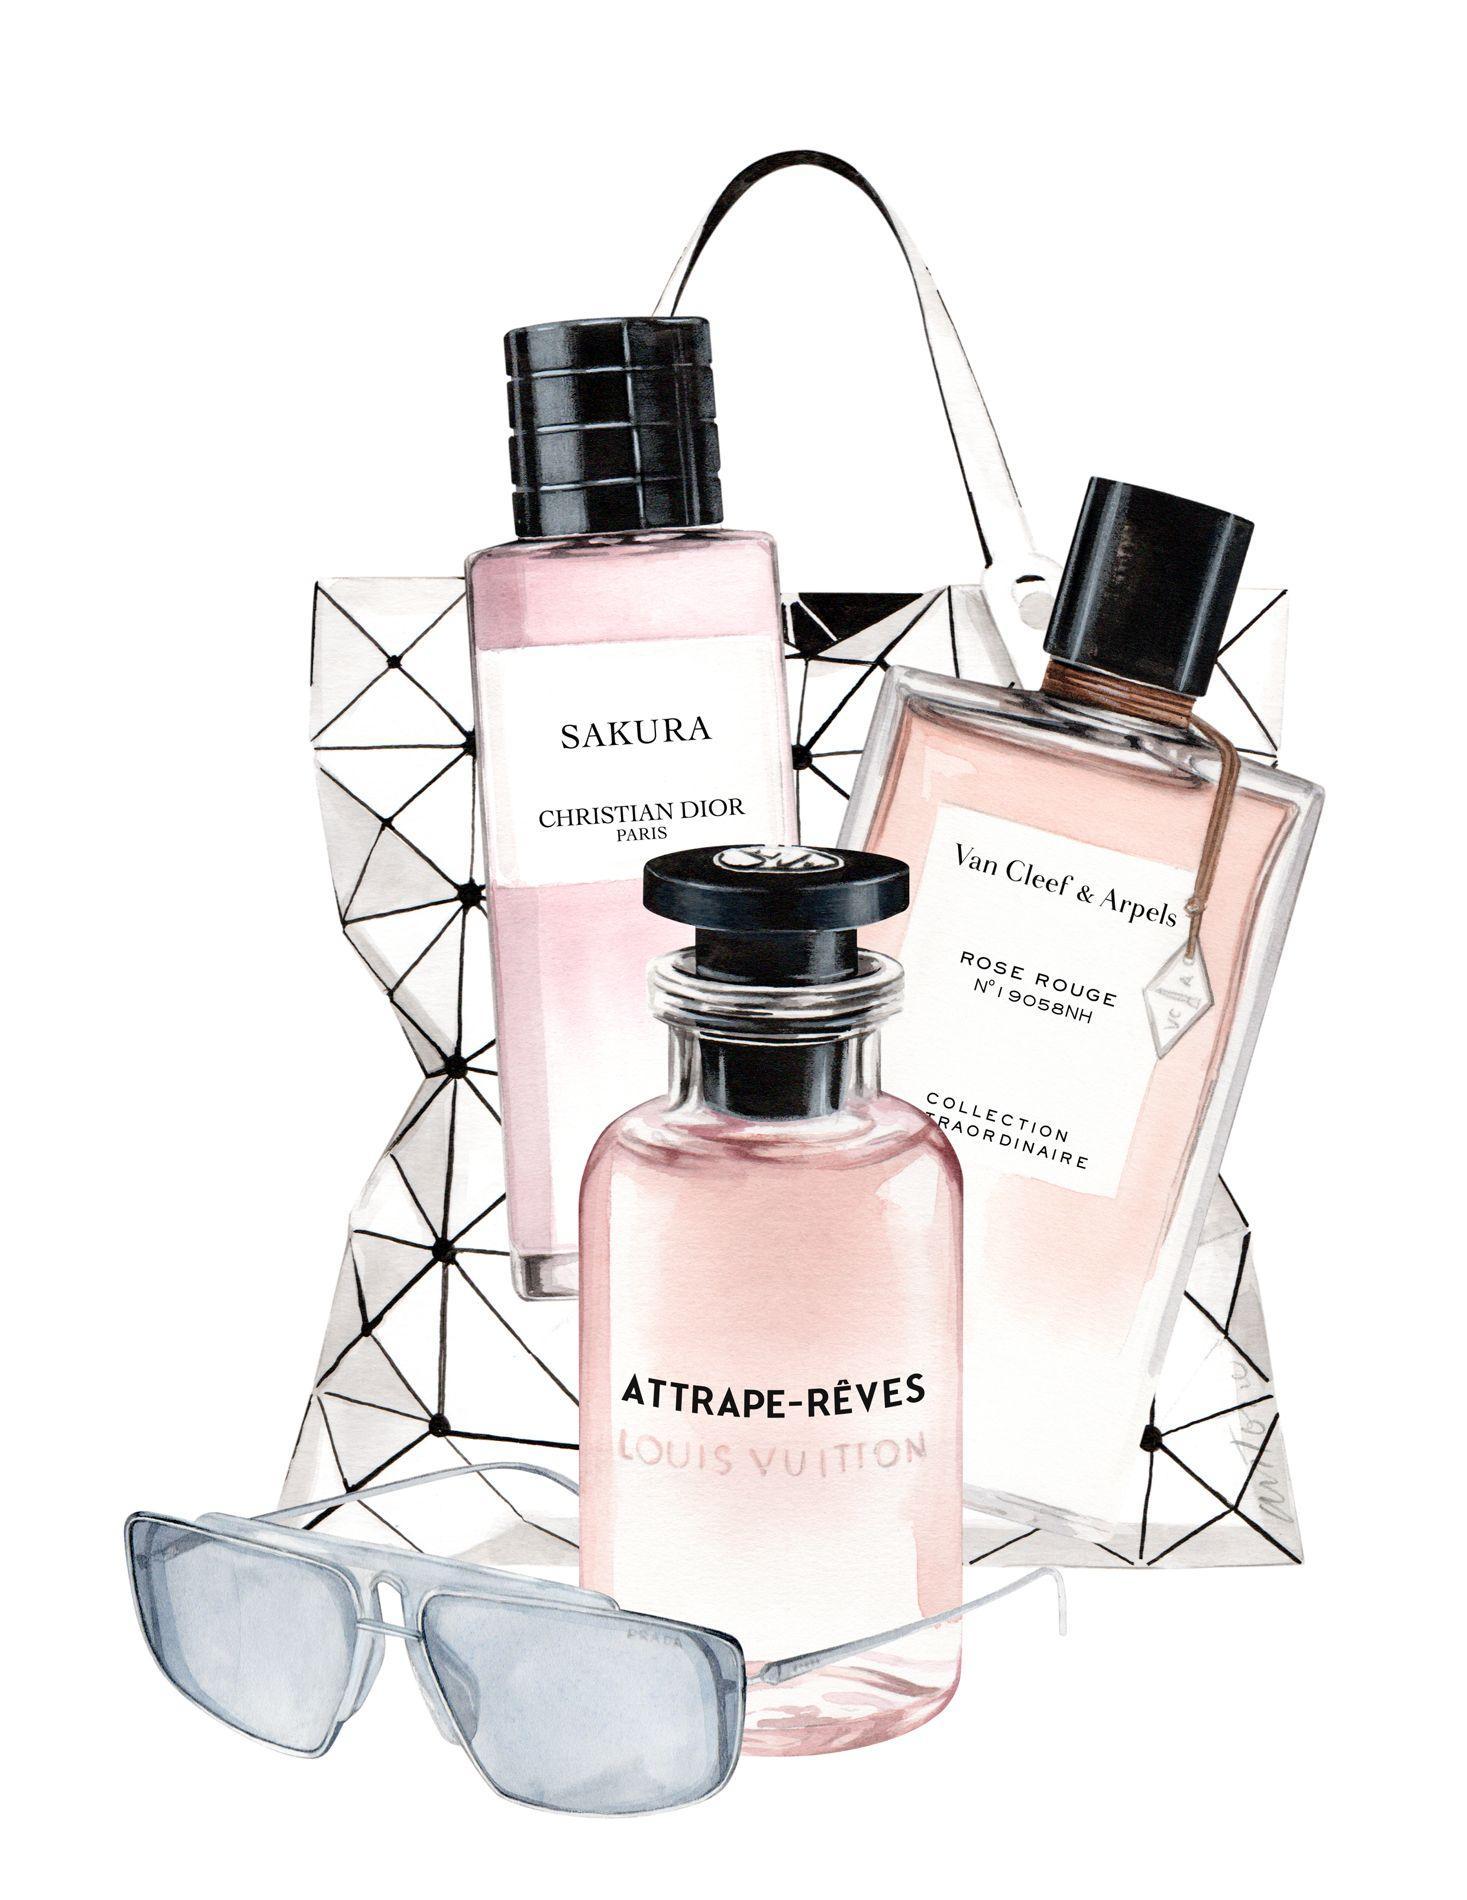 Look Comment Figaro Accorder Son Avec ParfumMadame hxCQrstdBo